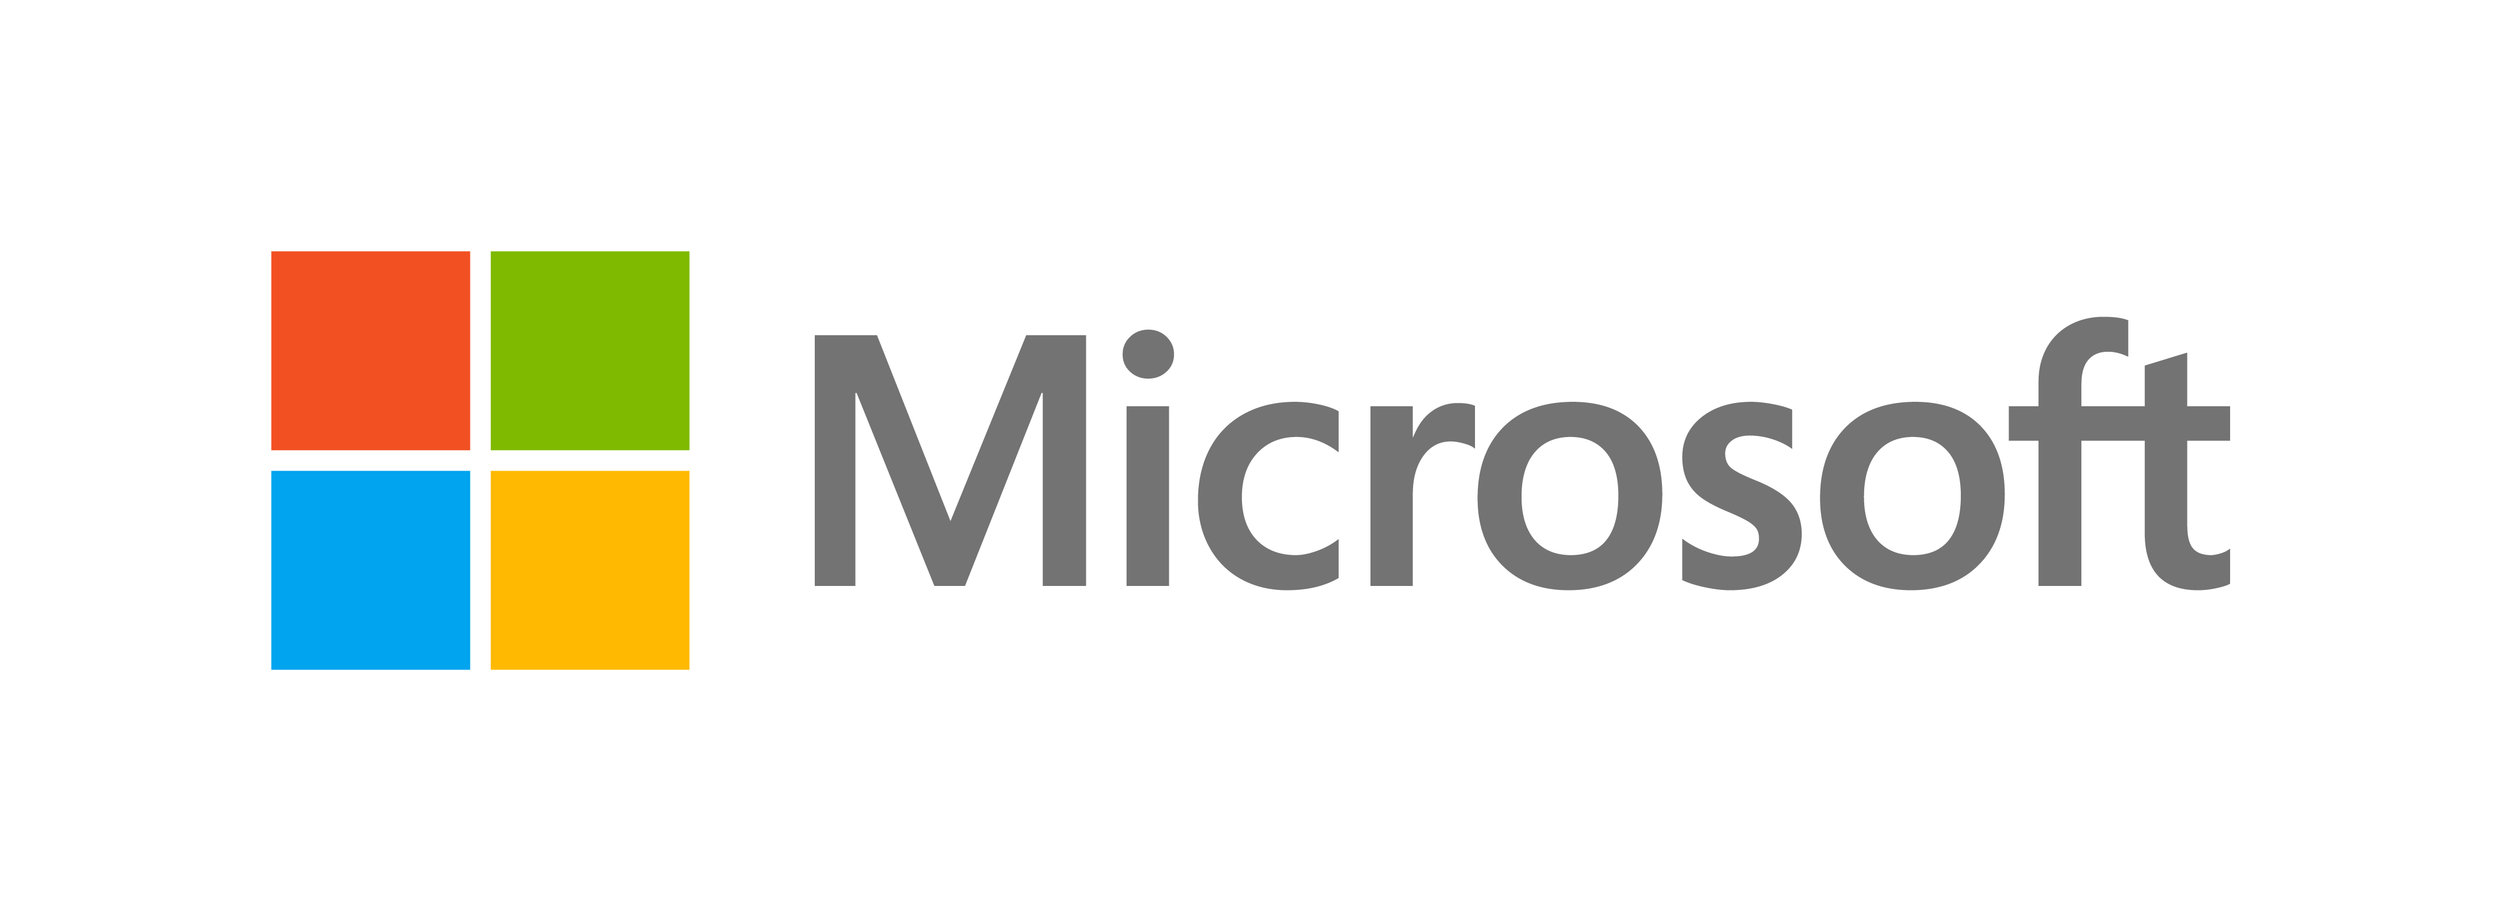 Microsoft logog.jpg